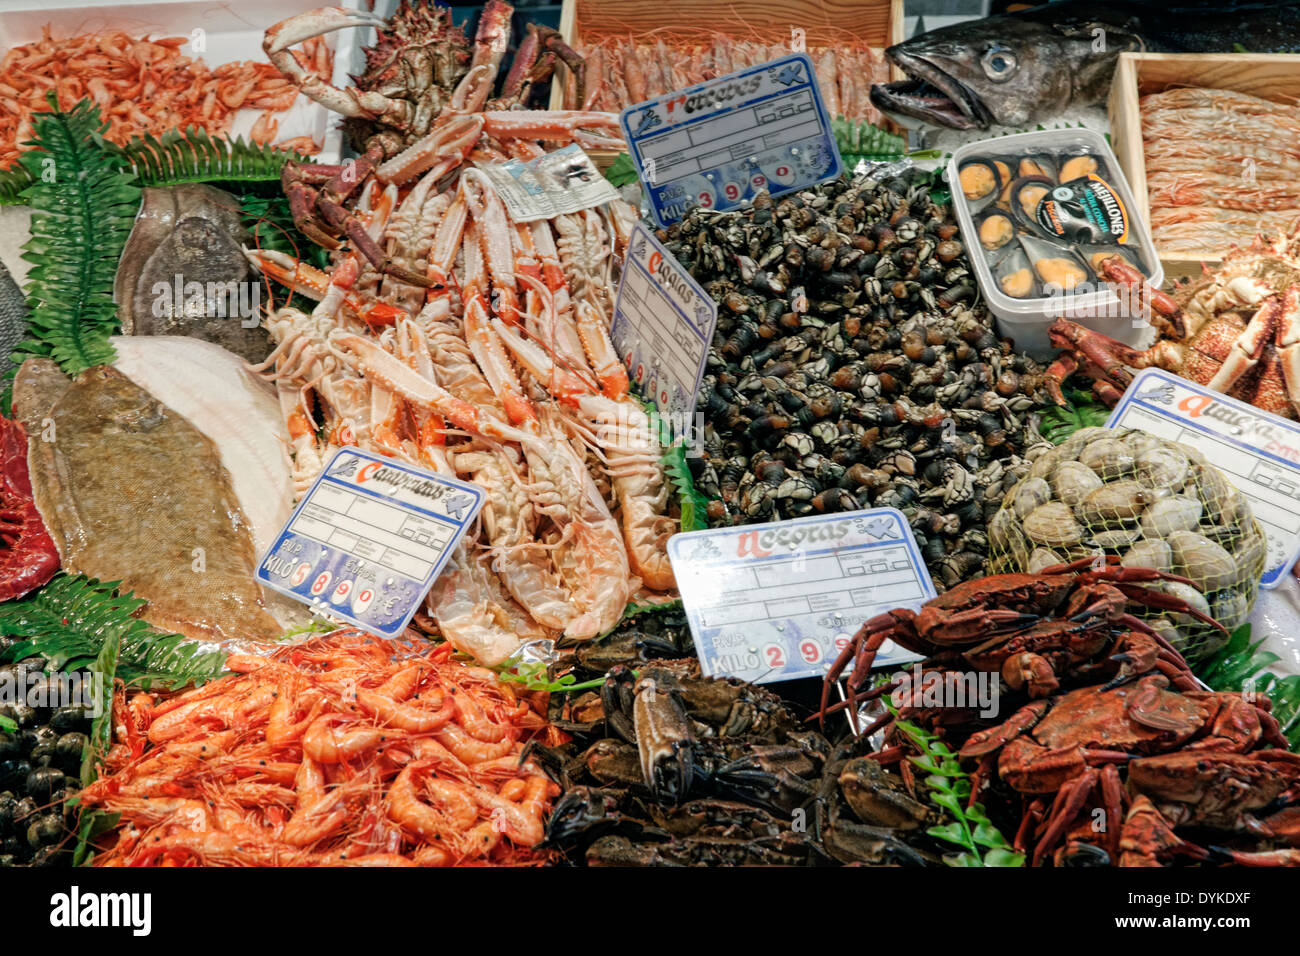 Fresh fish and seafood for sale at Mercado Central, a covered market, Plaza del Mercado, Salamanca, Castilla y León, Stock Photo